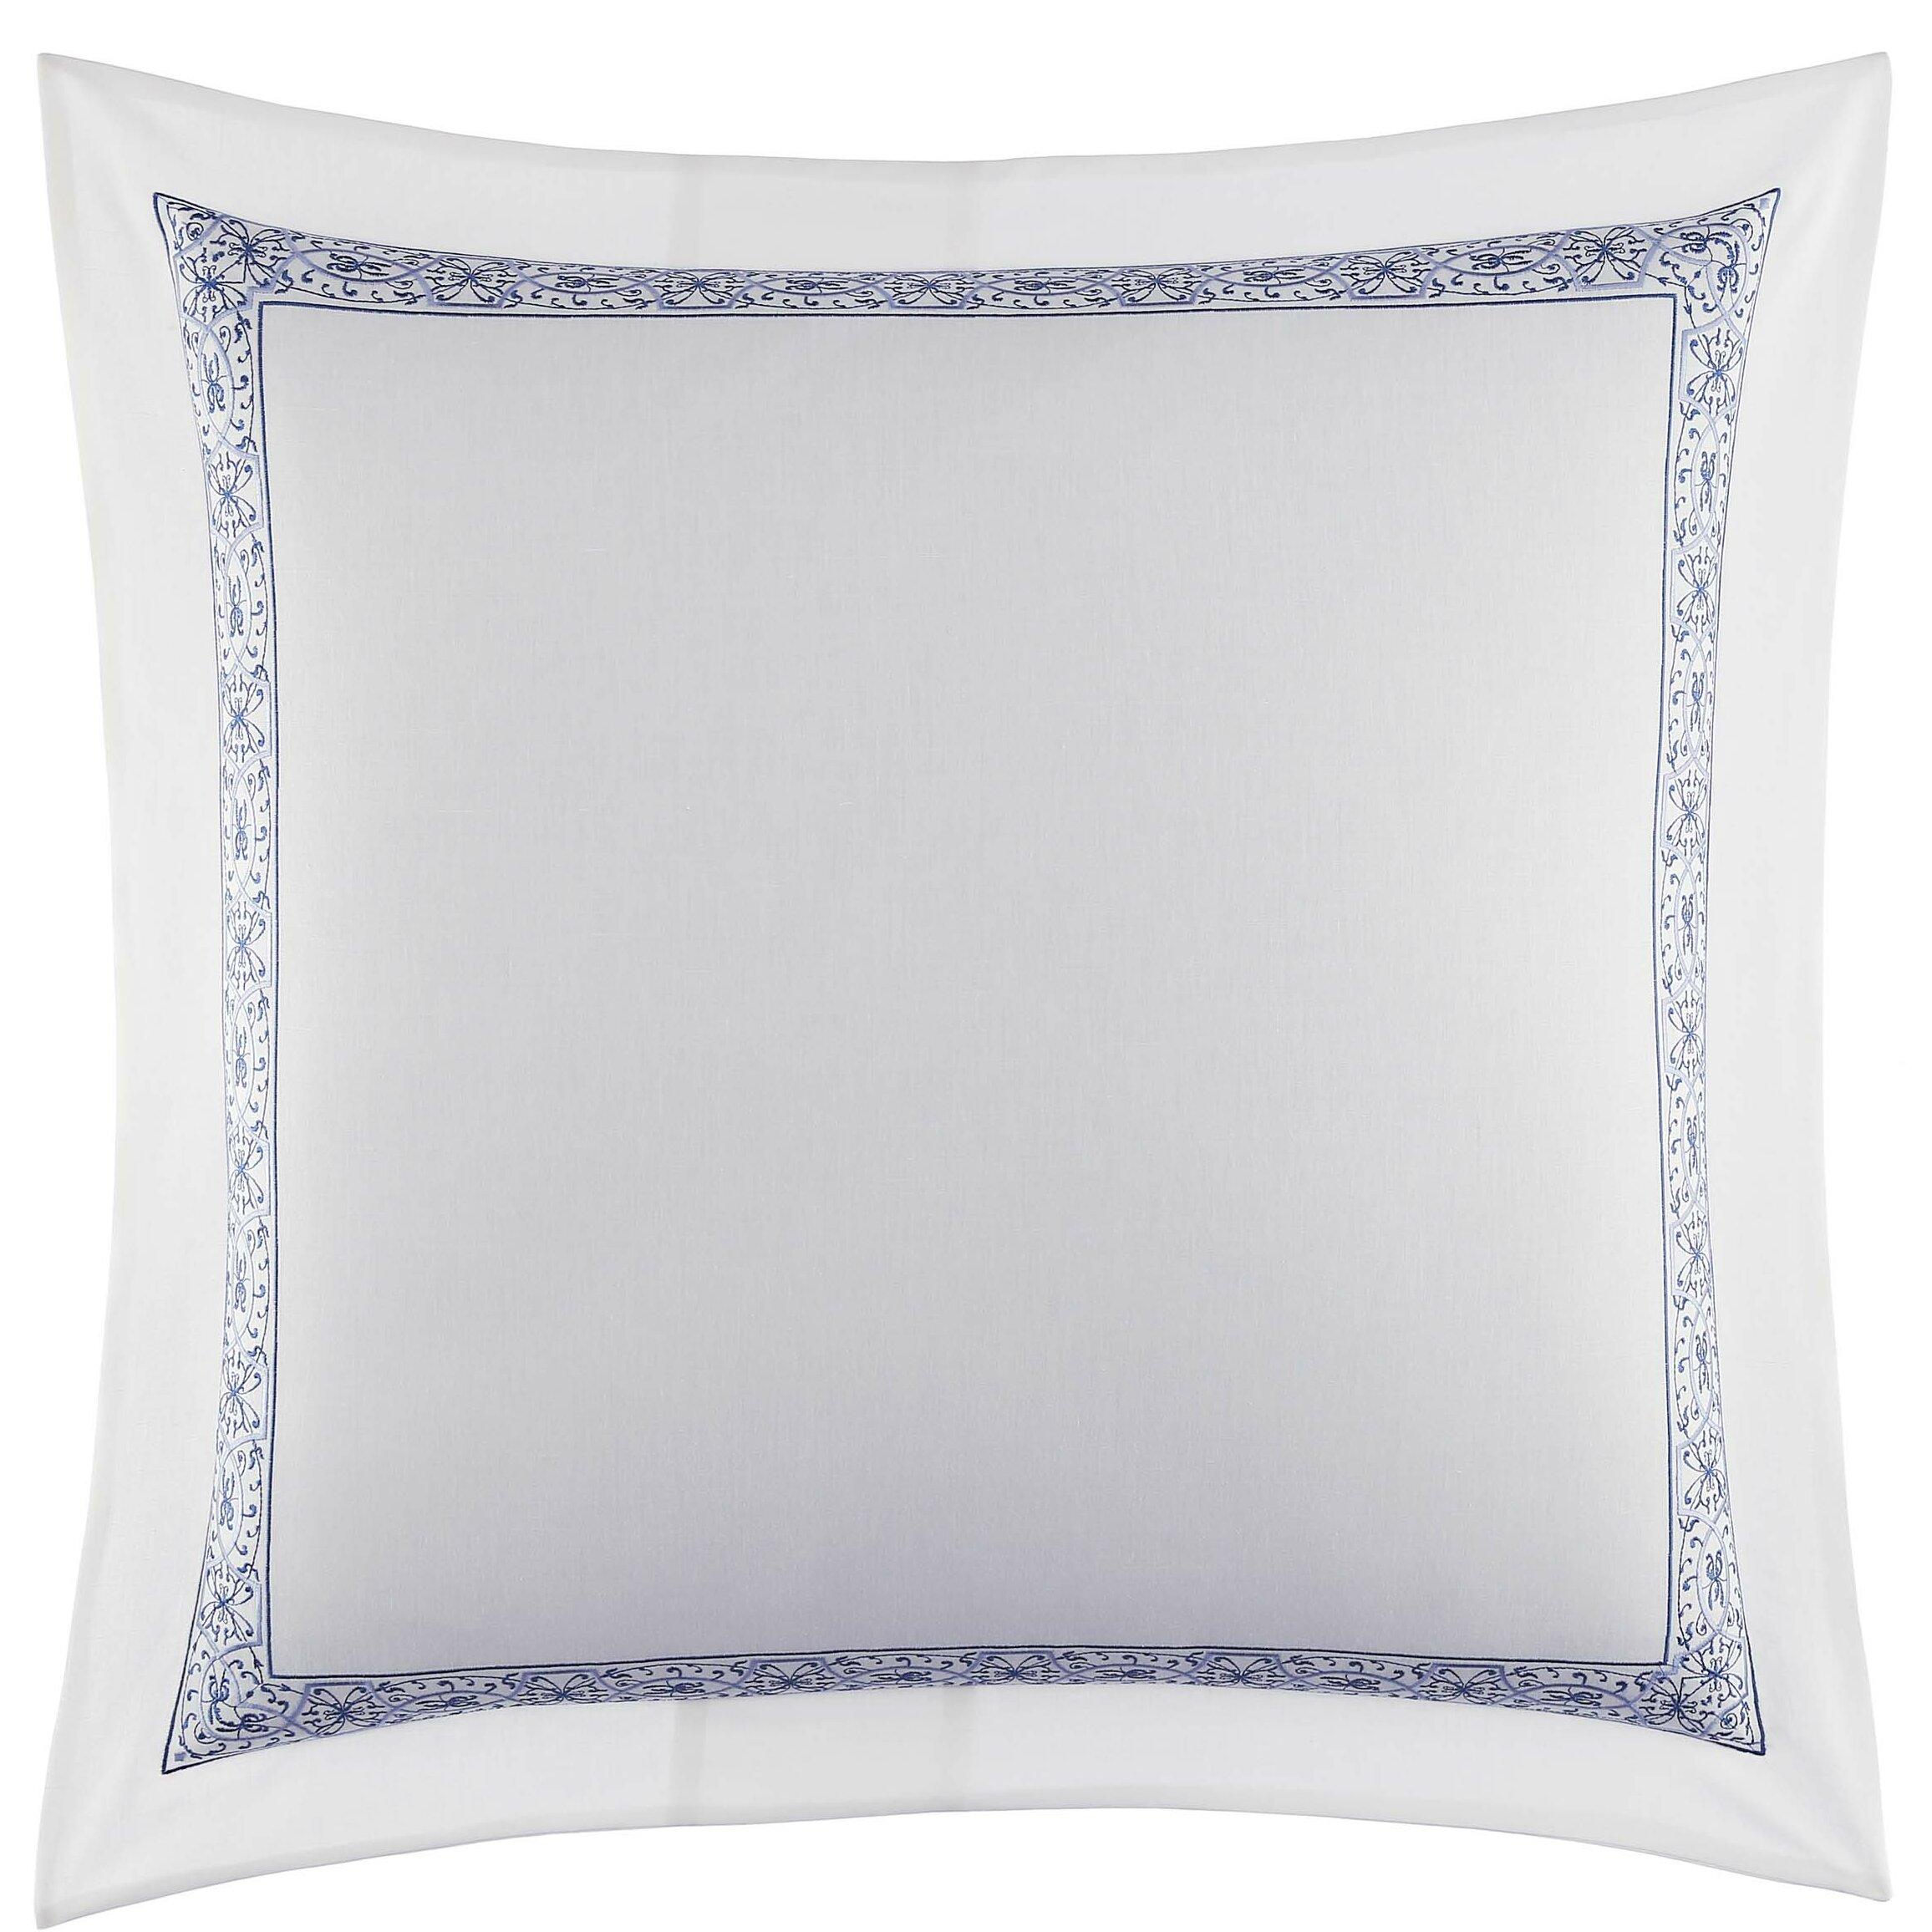 Laura ashley emilie comforter-3648